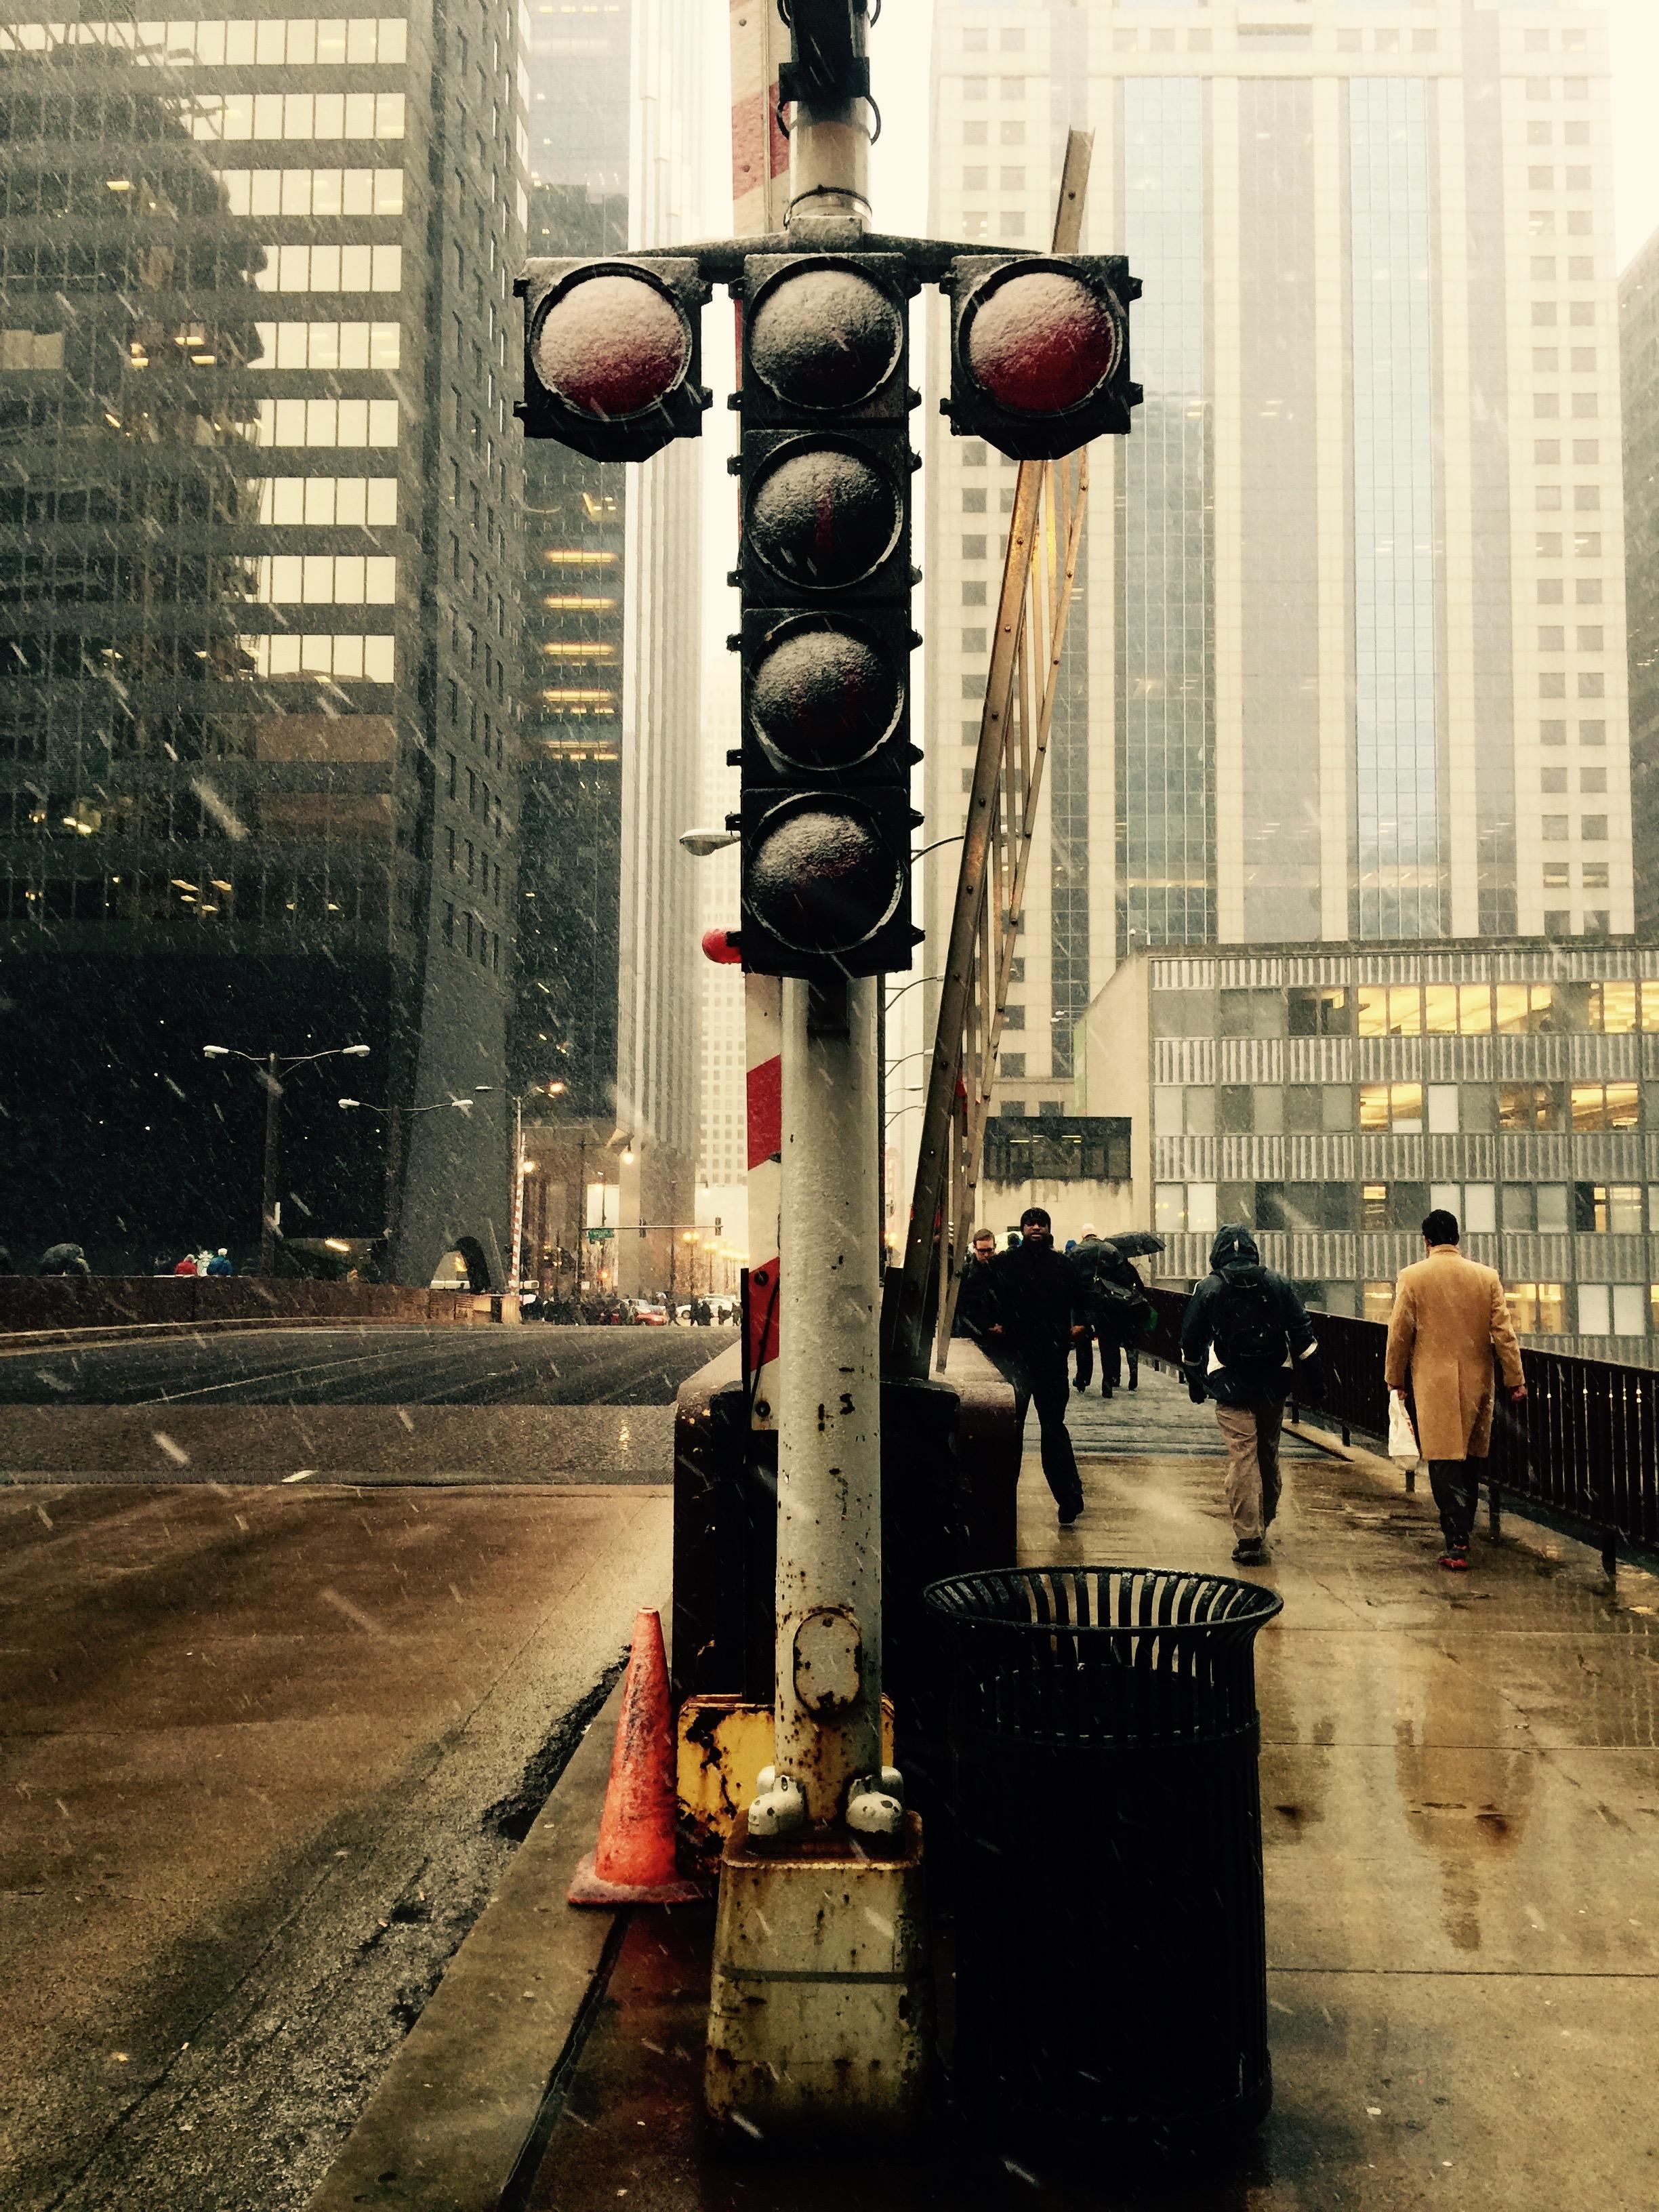 1000 Amazing Traffic Light Photos Pexels Free Stock